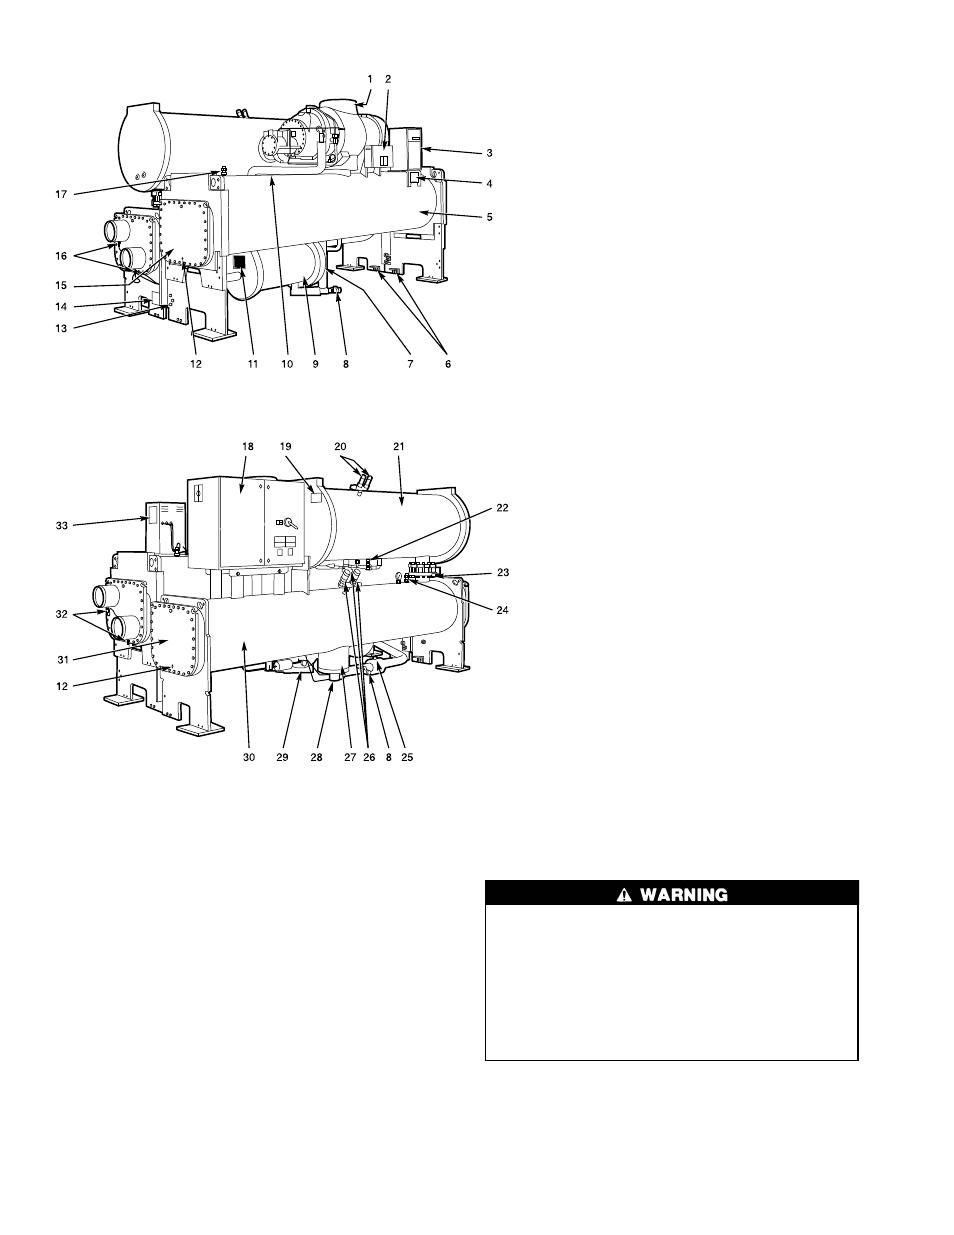 2003 hyundai sonata wiring diagram pdf html